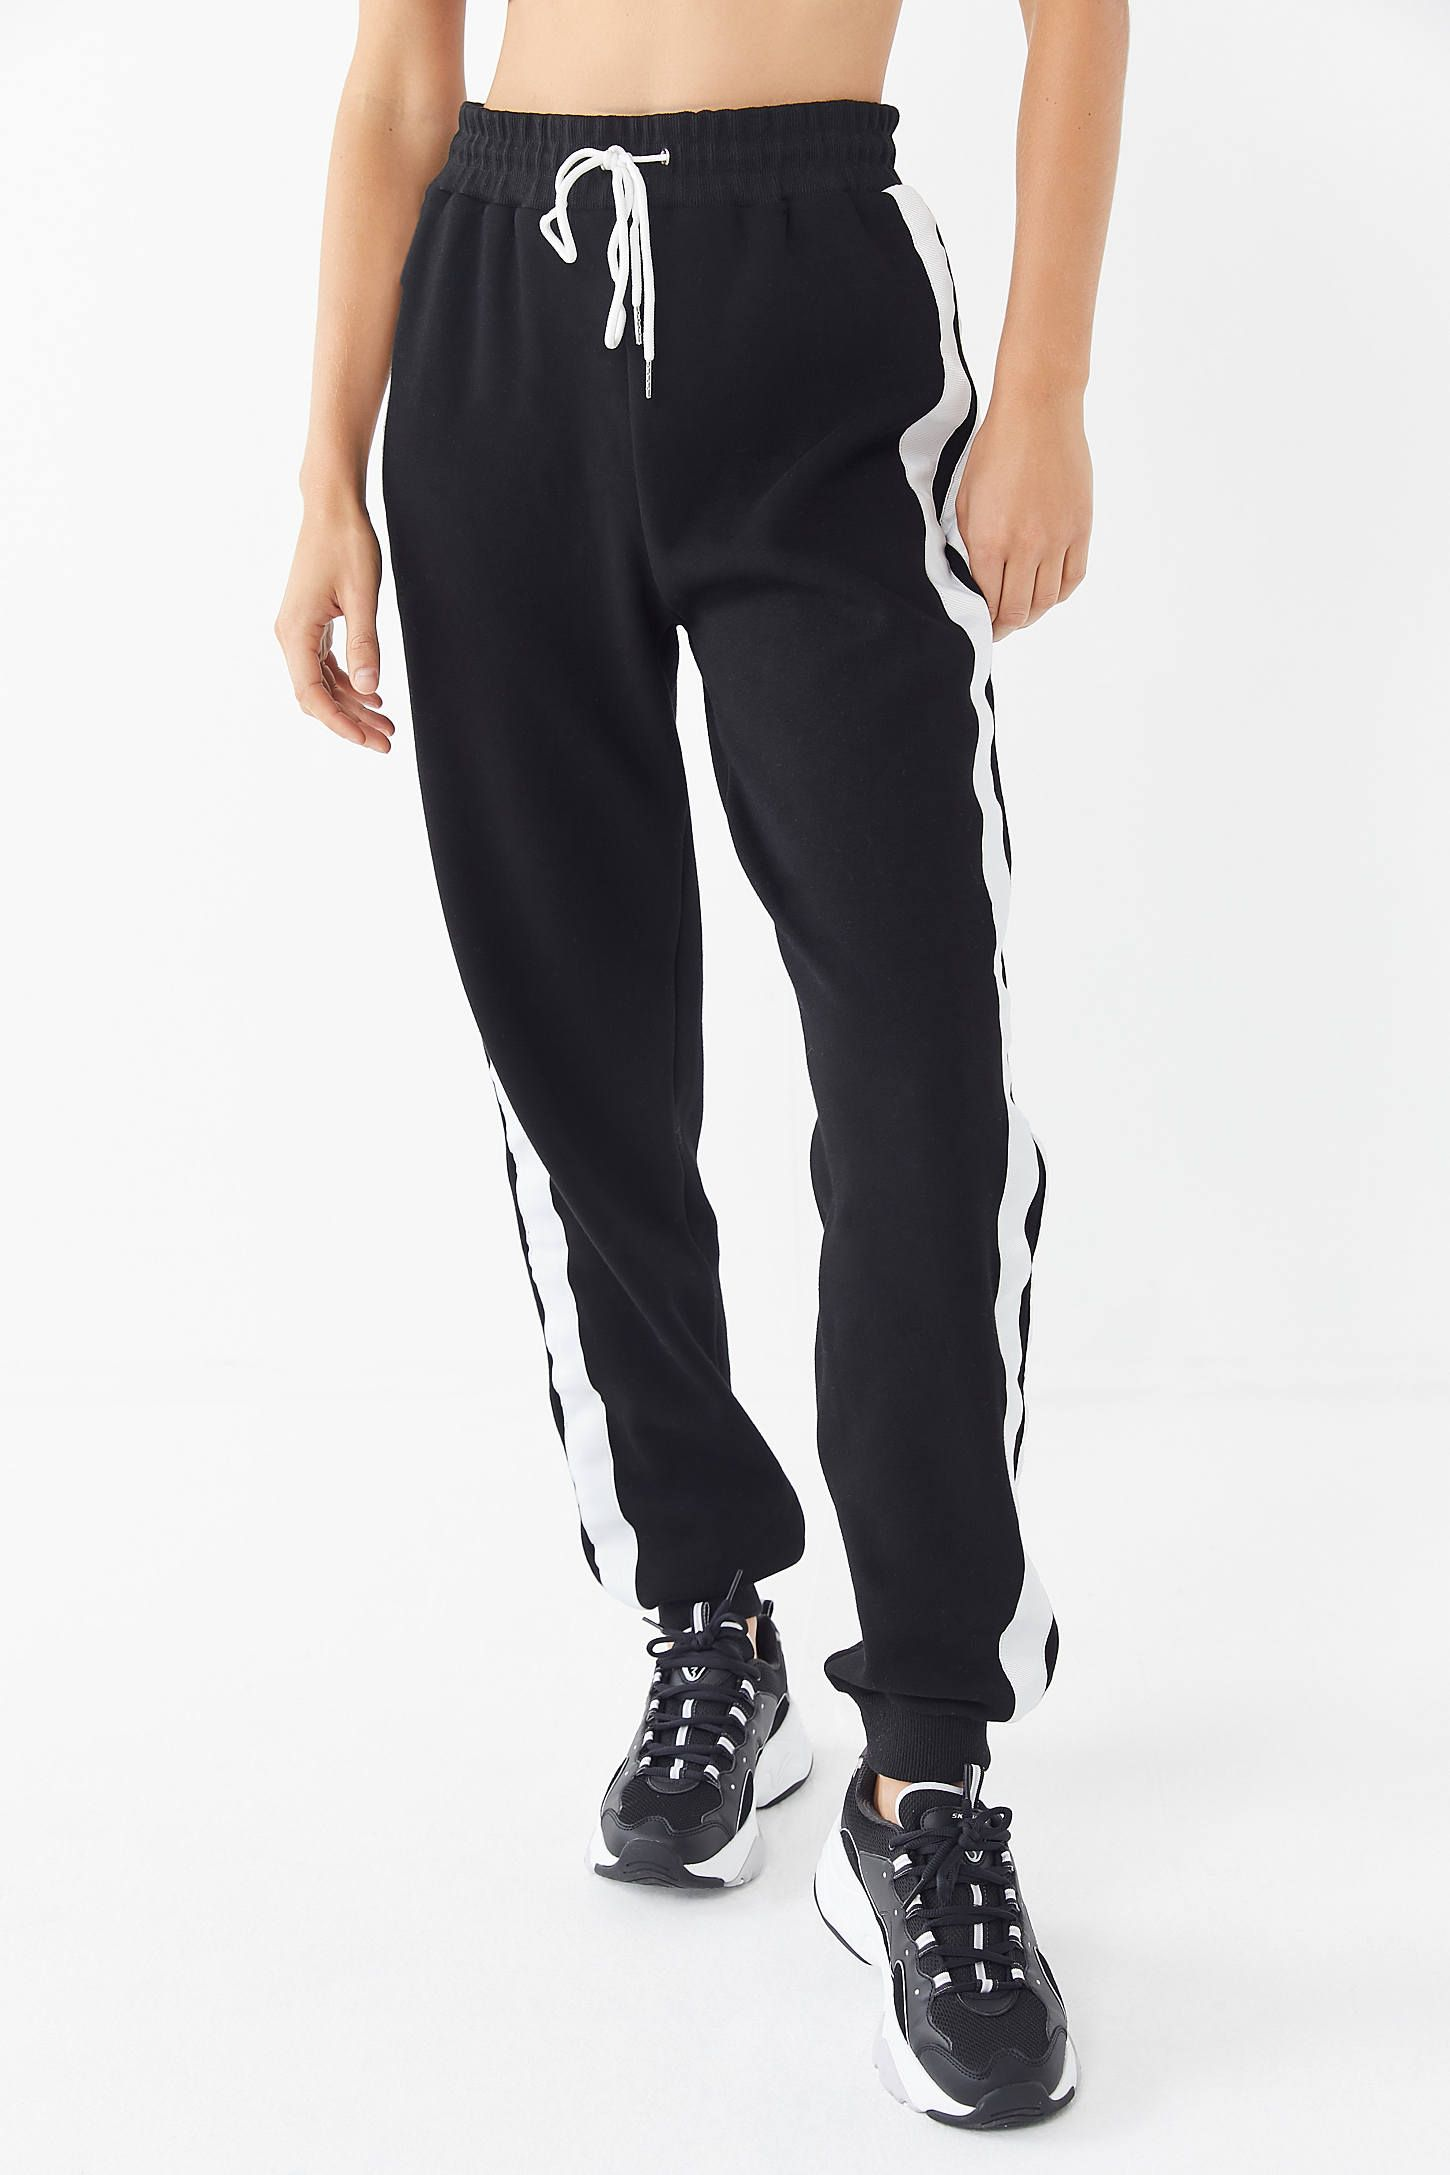 Womens Low Waist Yoga Pants//Fashion Leggings Robert Drake Amazing Unique Designs